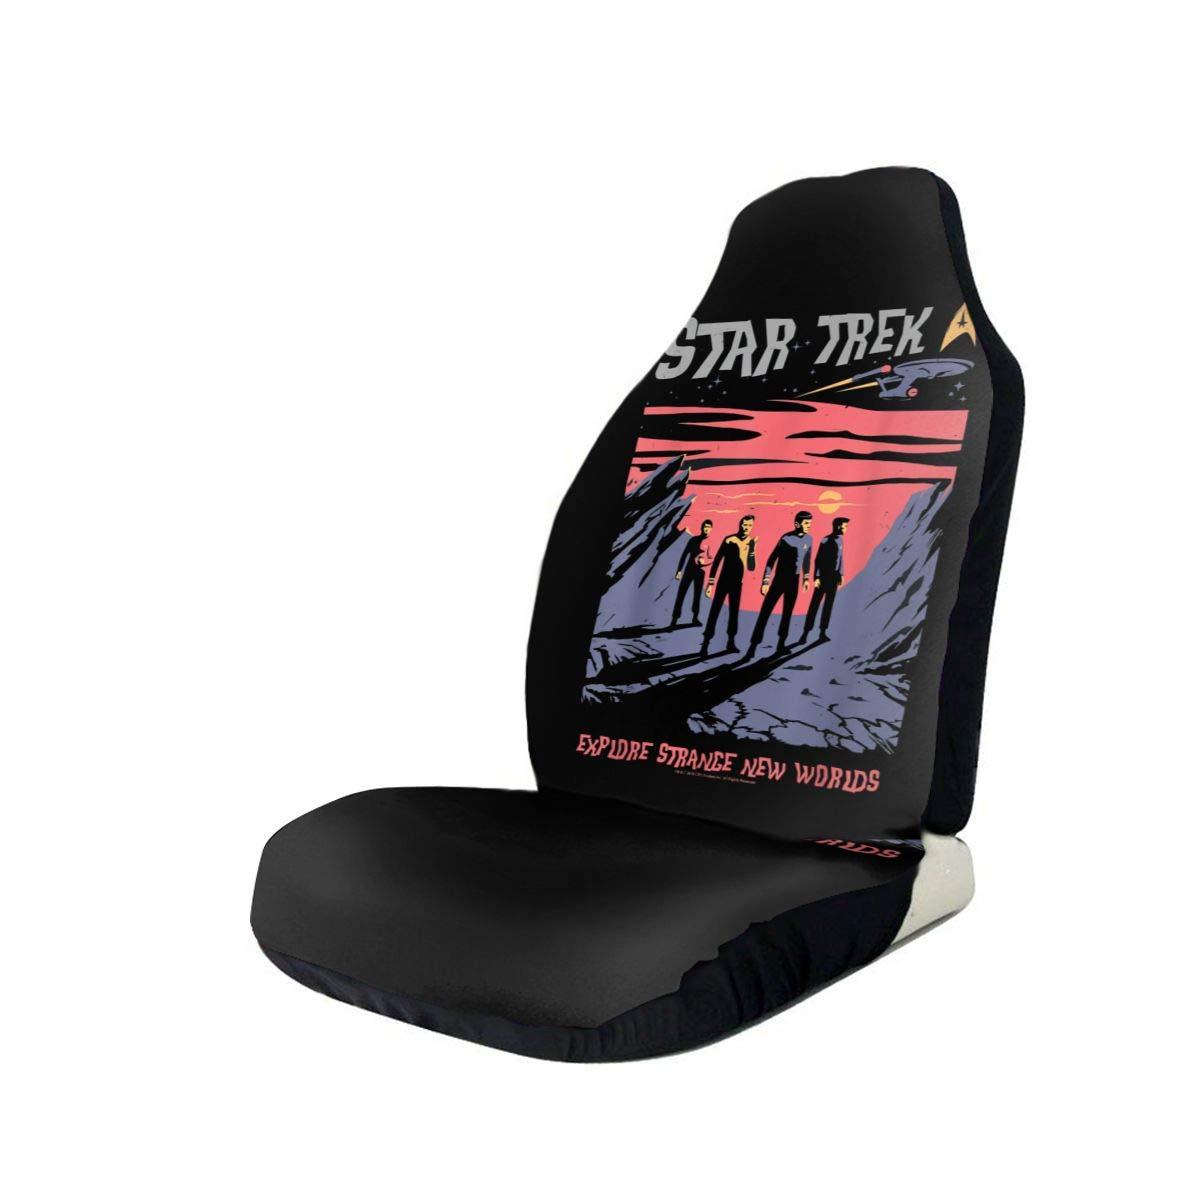 Star -Trek Car Seat Covers Car Seat Protector Covers ,Fit Most Cars, Sedan, SUV,Van